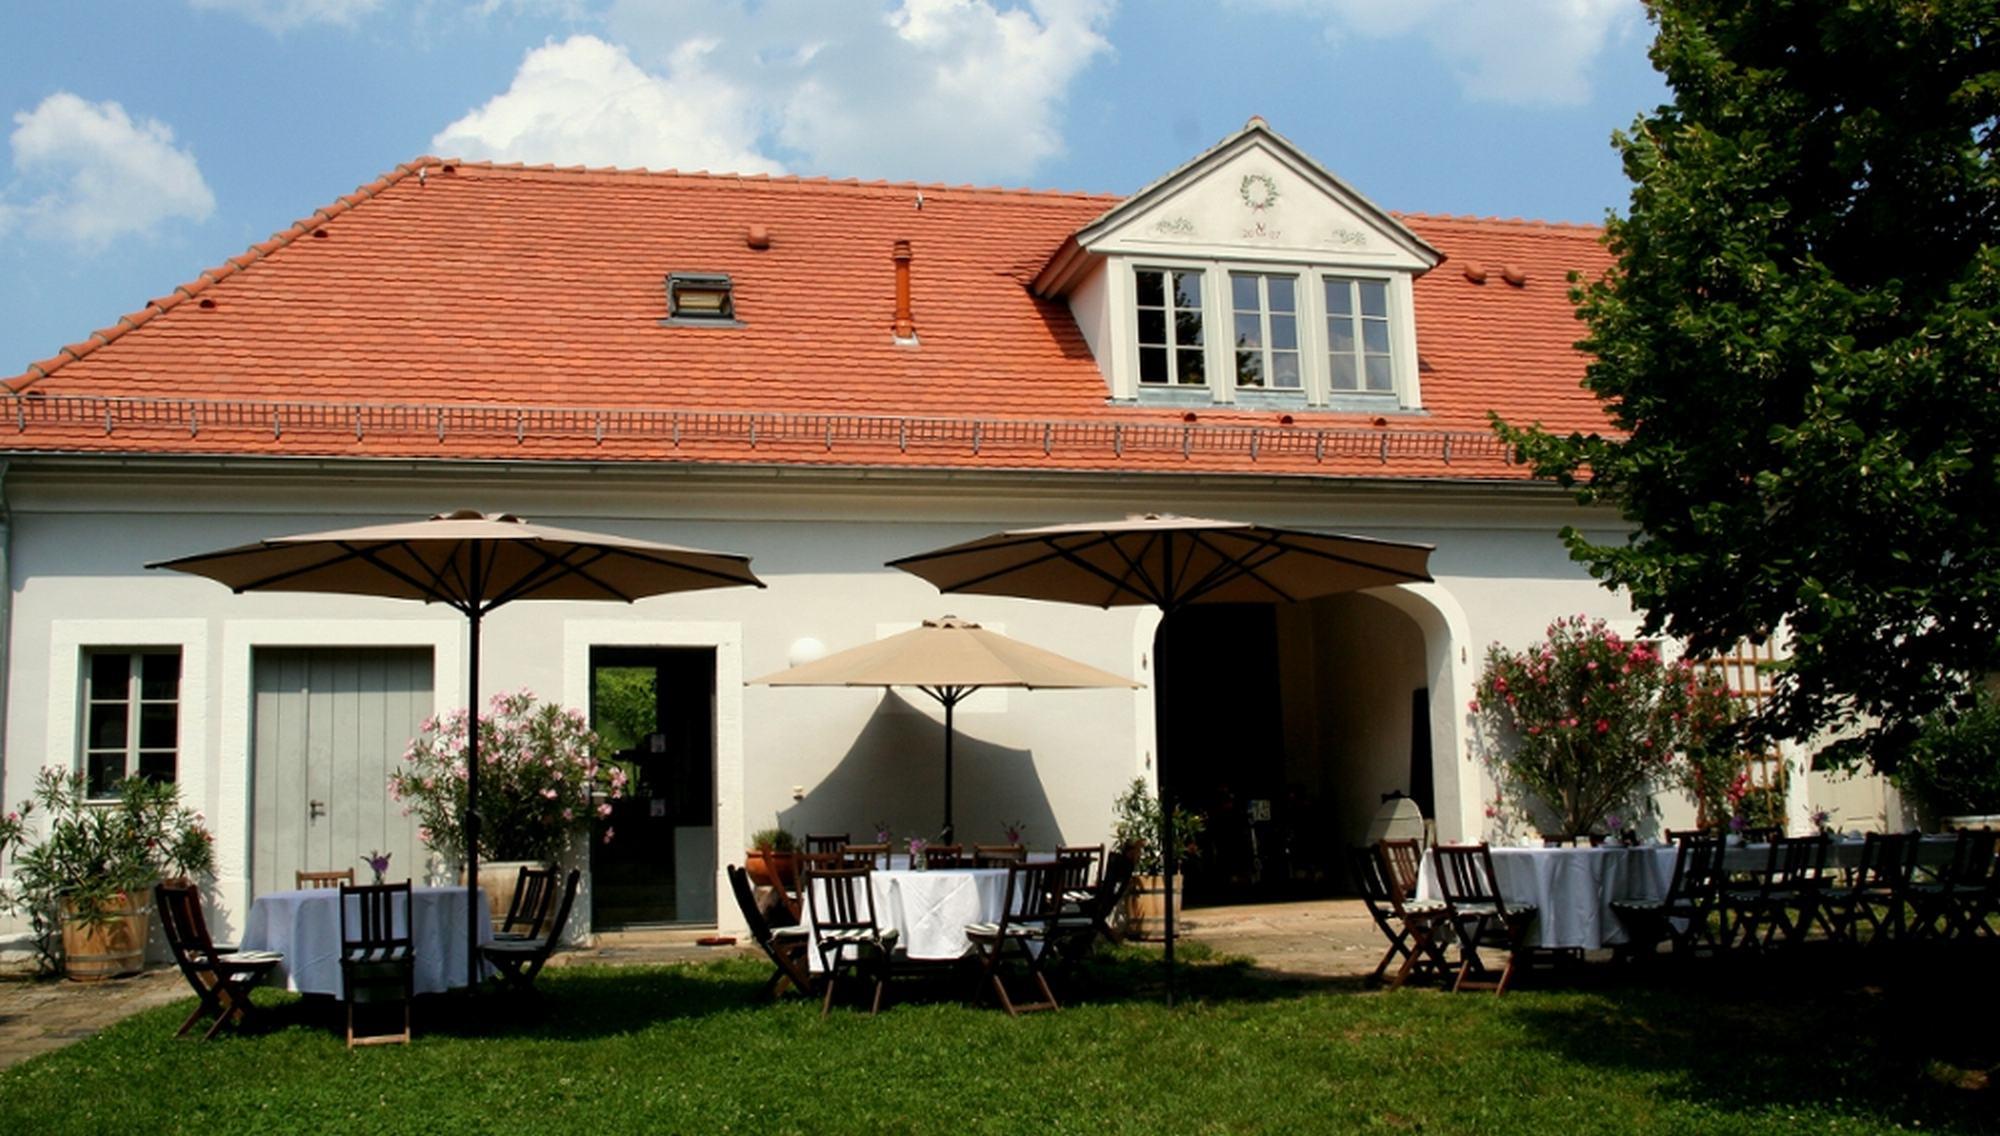 Haus Steinbach - Event Locationin Radebeul